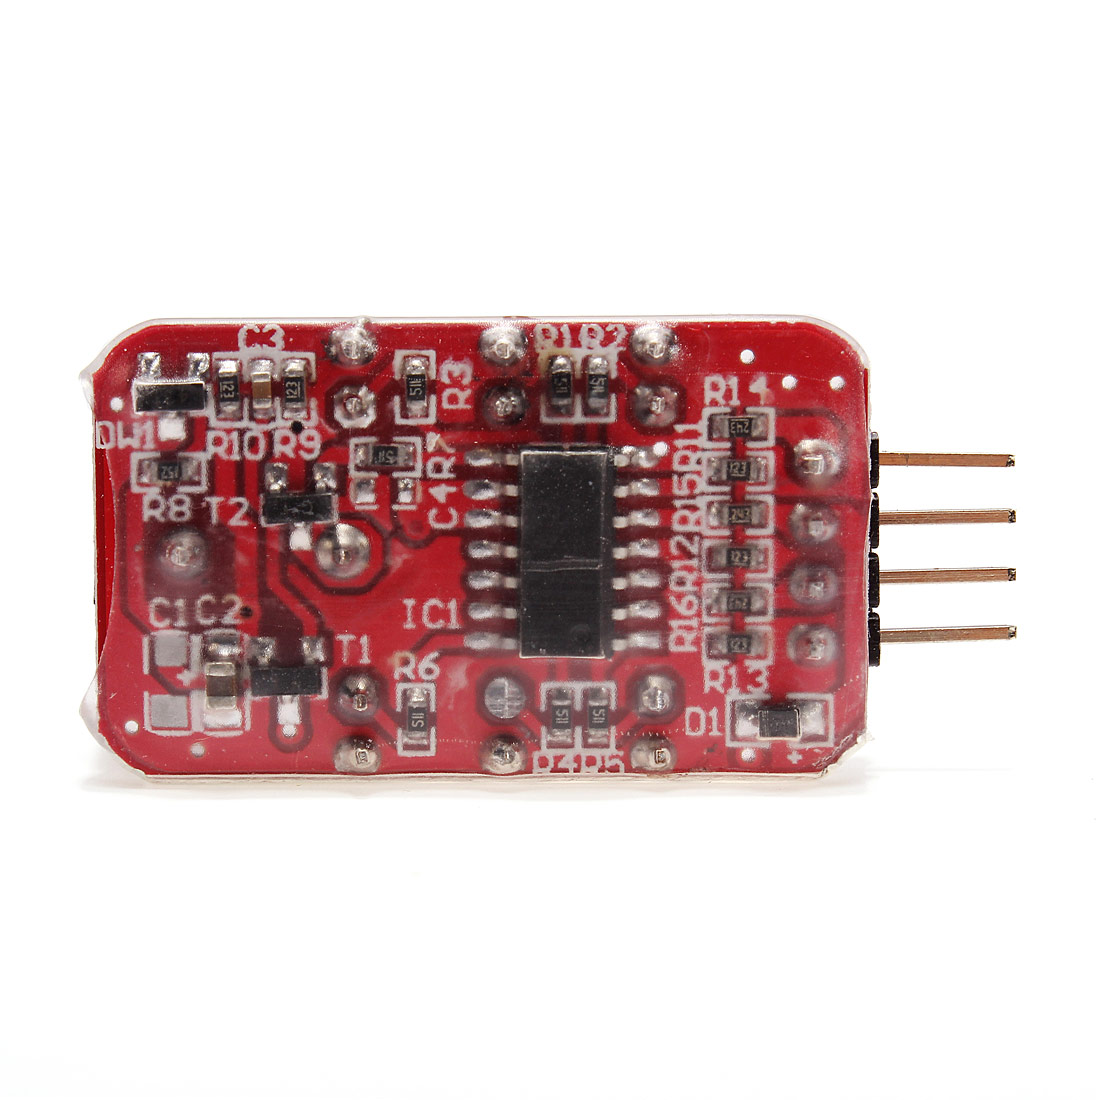 Sensitivelow Alarm-Indicator RC 2pcs/Lot Voltage-Alarm Buzzer Lipo-Battery 2S-3S